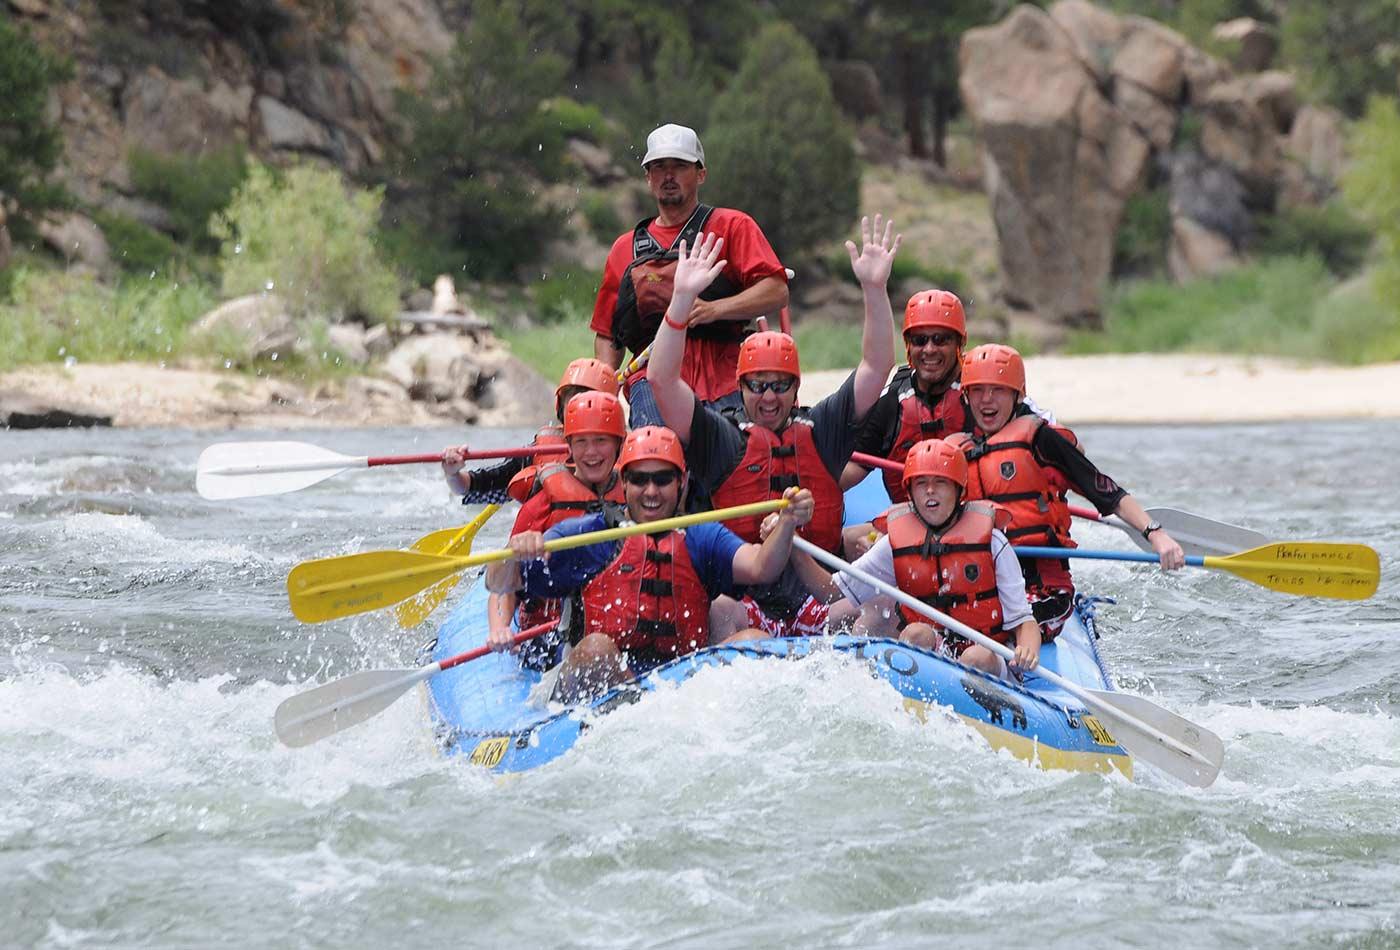 River rafting in Colorado.